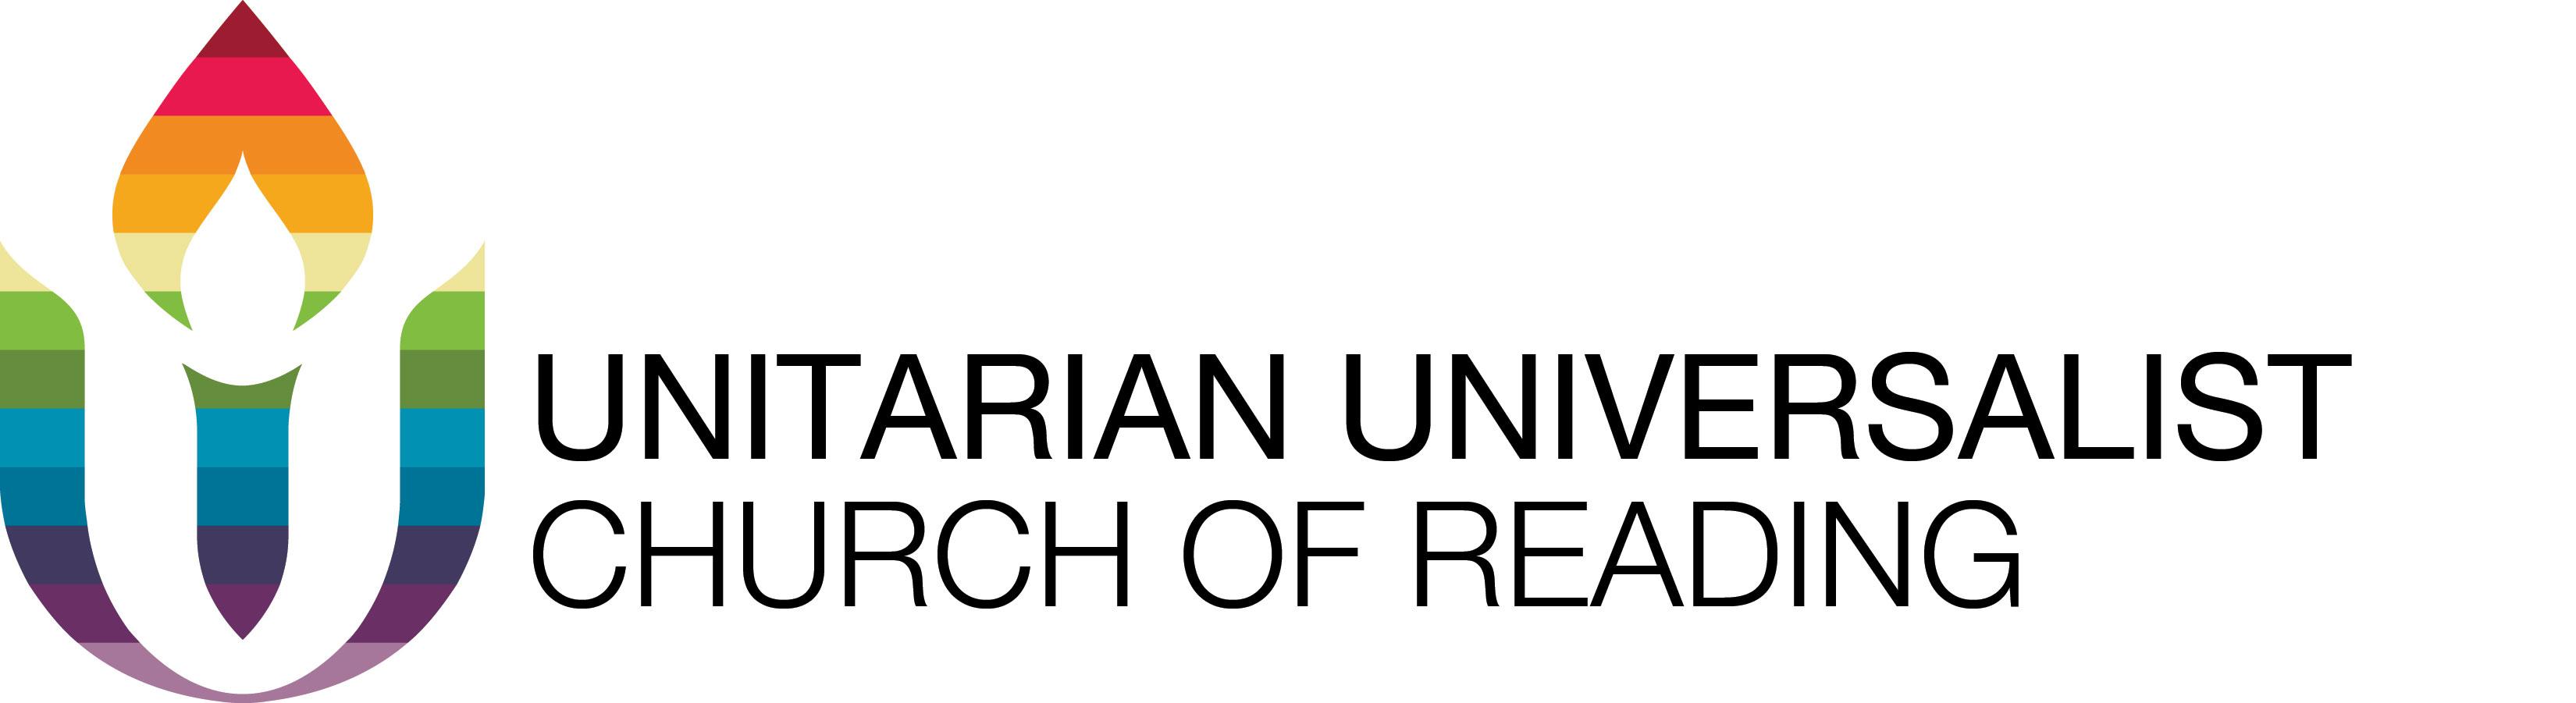 Unitarian Universalist Church of Reading